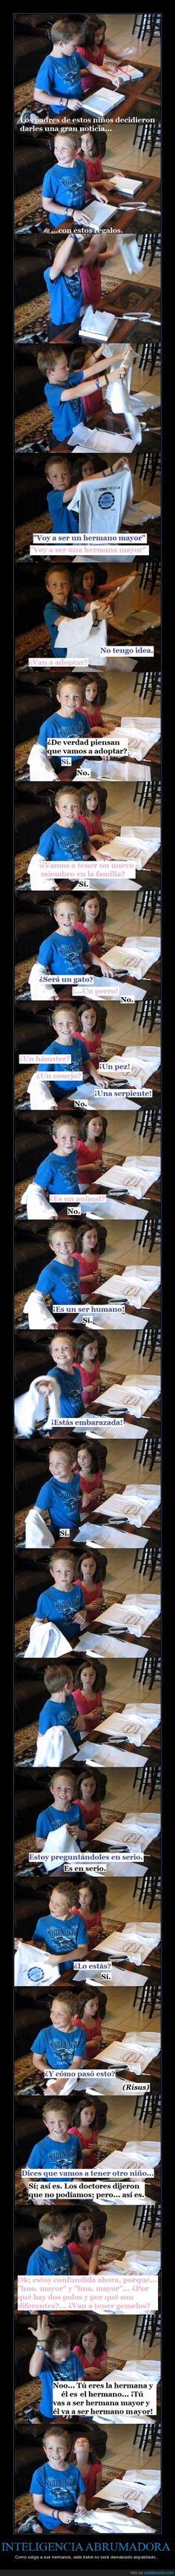 Las 10 mejores imágenes de Funny Kids :D   Funny kids, Funny babies y  Hilarious